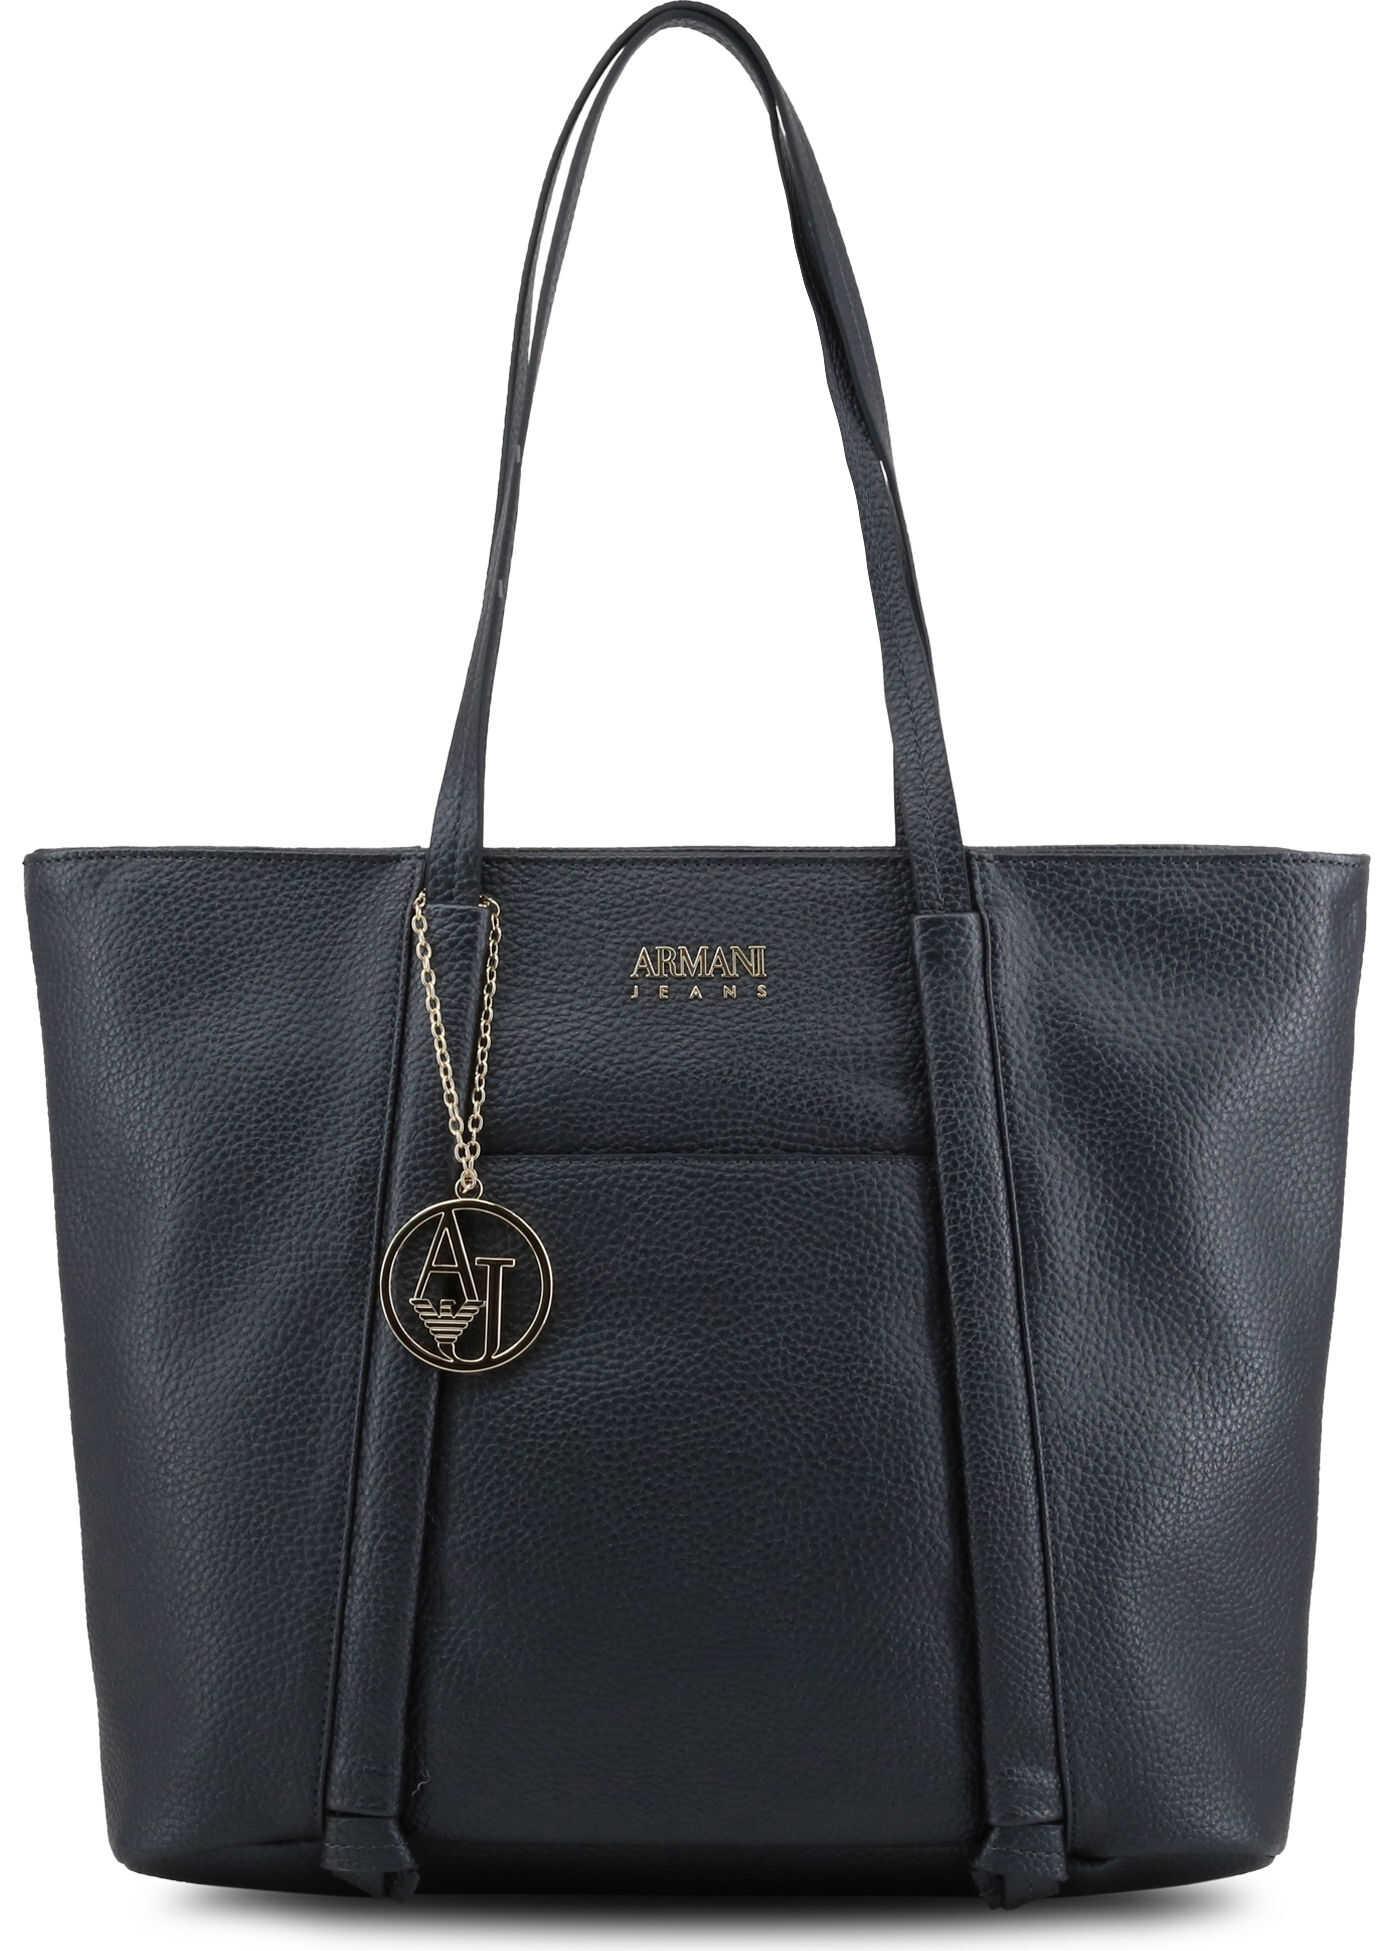 Armani Jeans 922341_Cd813 BLUE